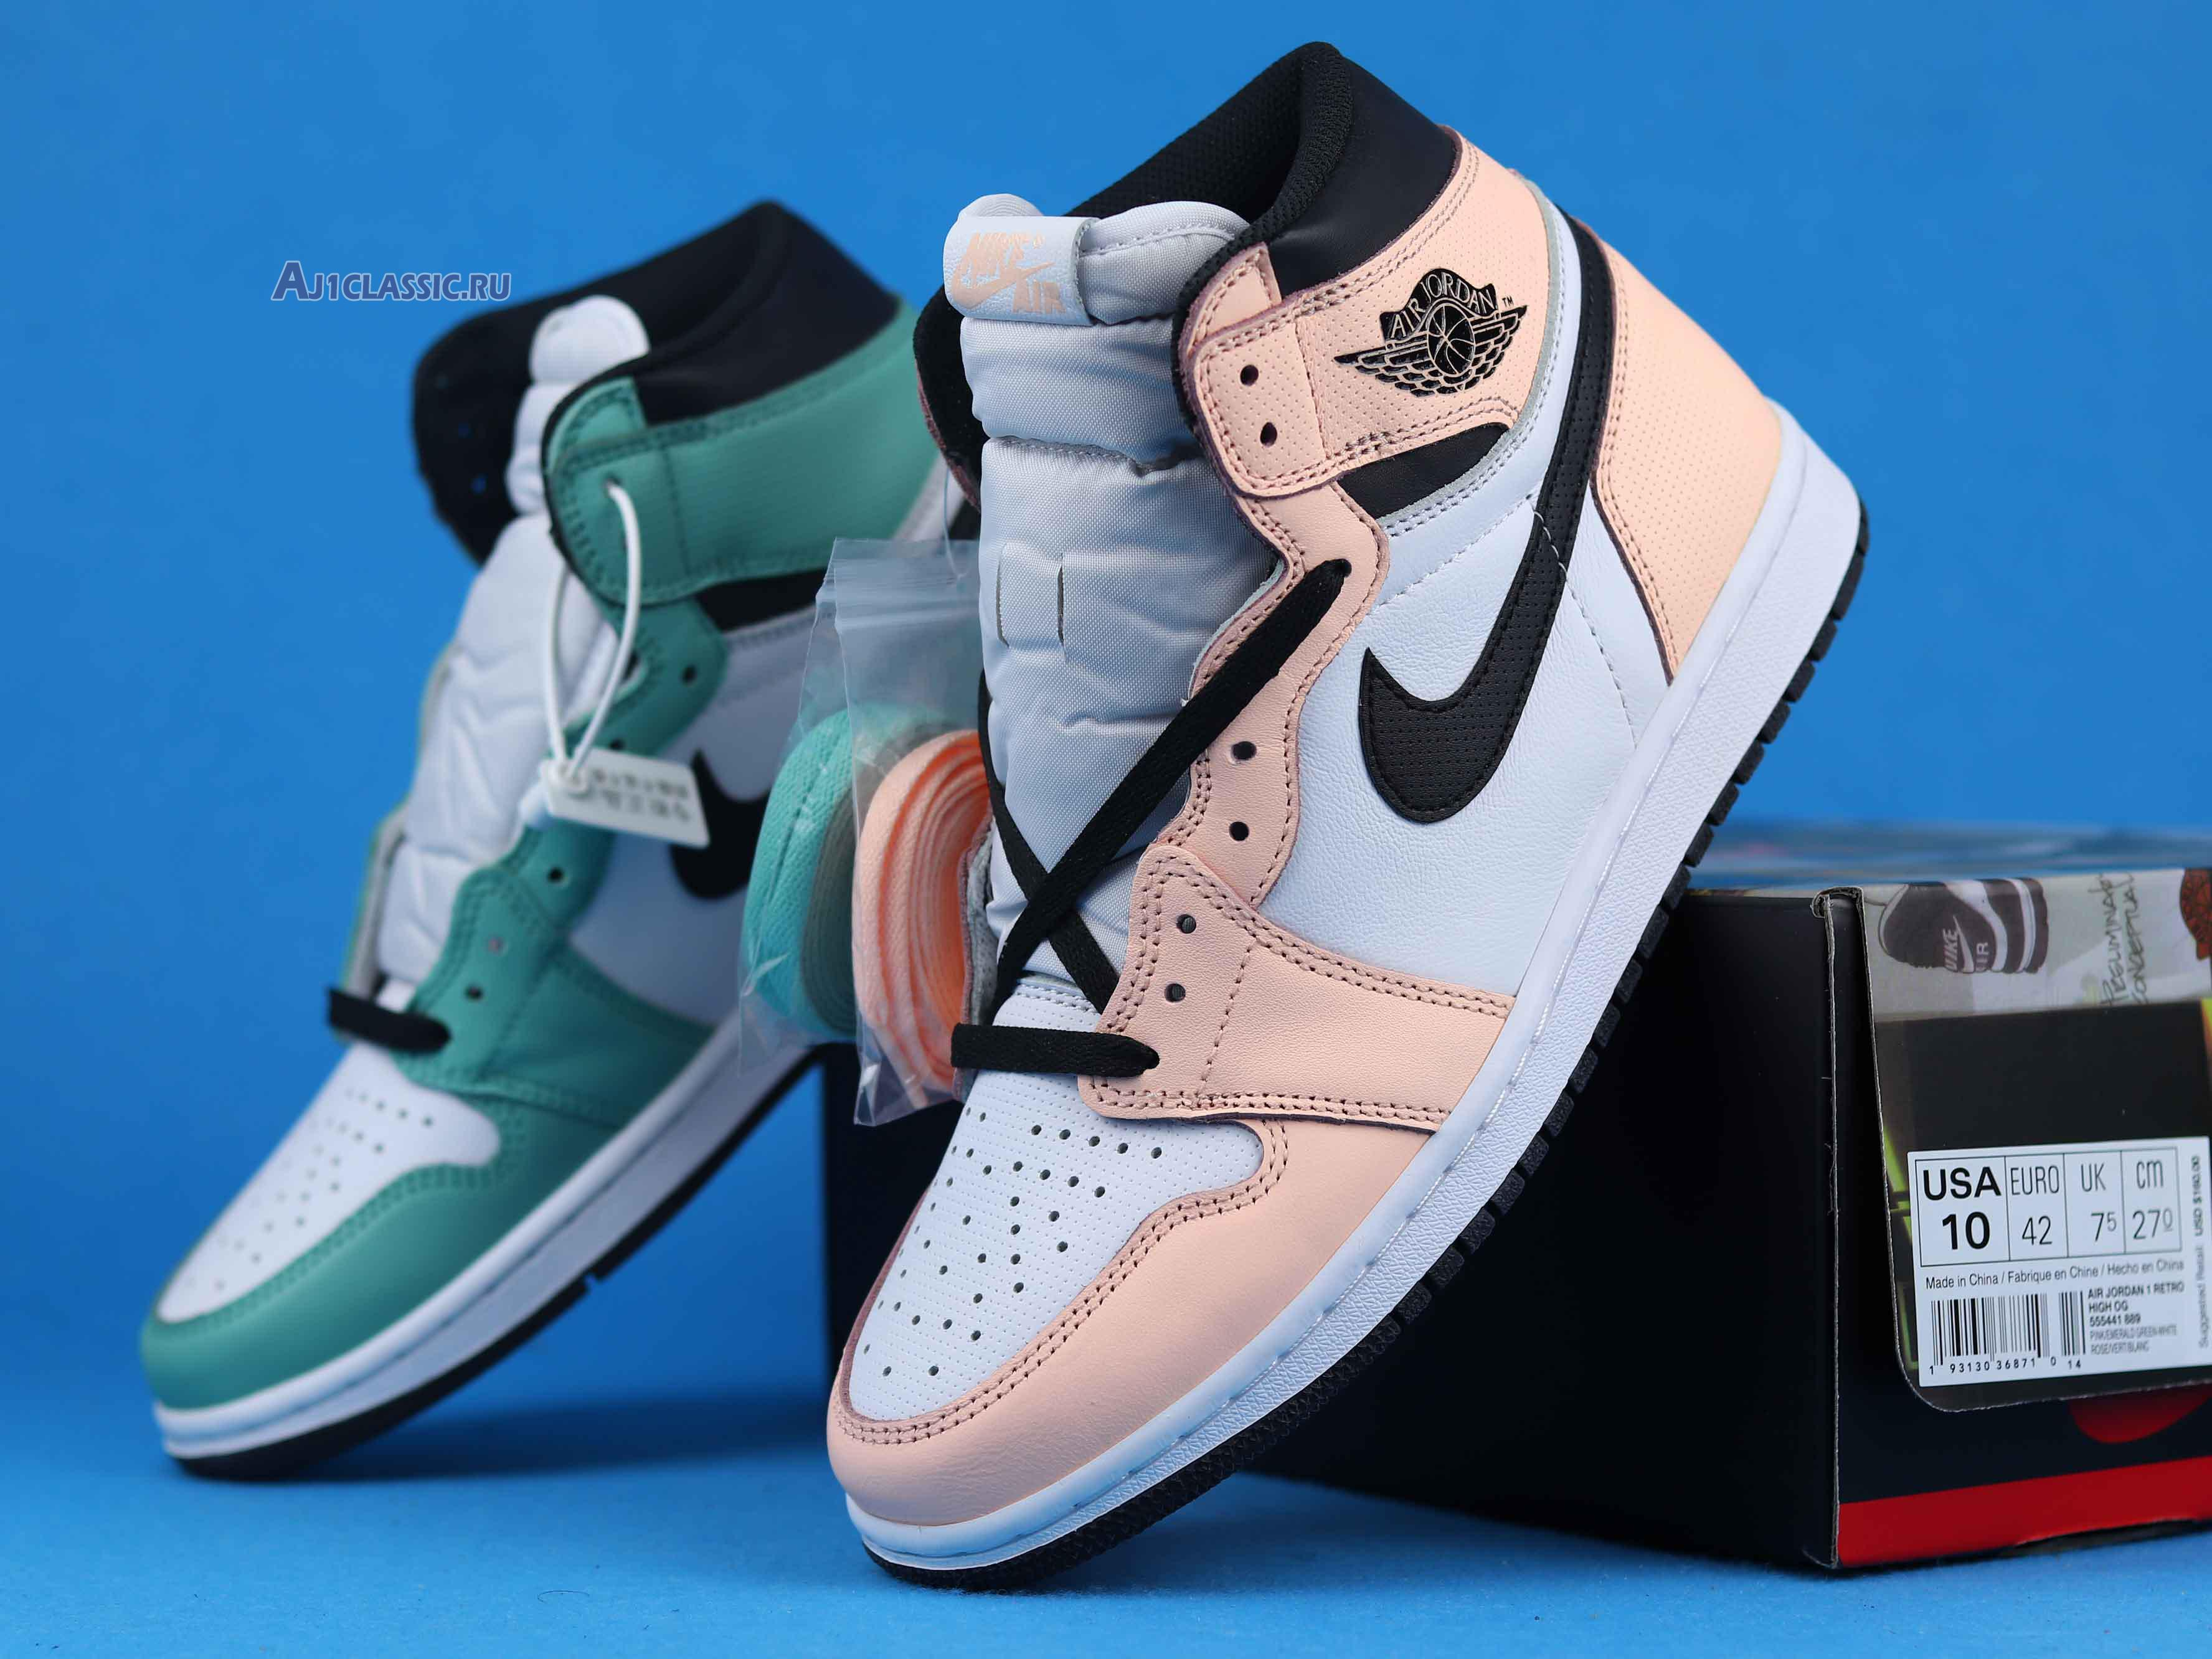 "Air Jordan 1 Retro High OG WMNS ""Multi Color"" 555441-889"